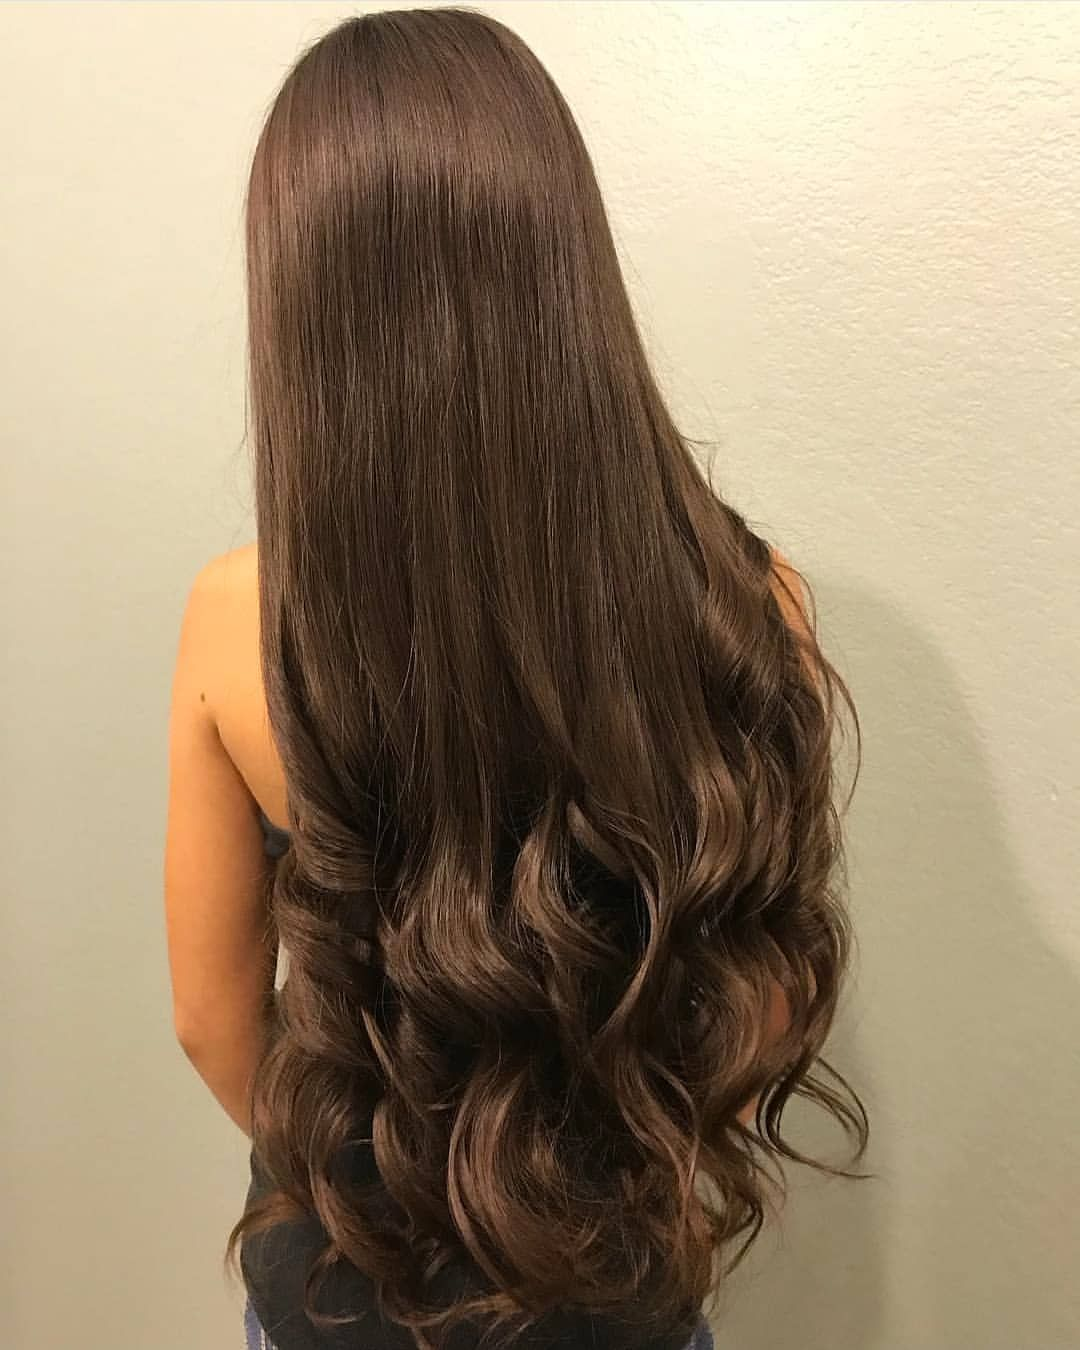 Sexiest Hair Sexiesthair Instagram Photos And Videos Beautiful Long Hair Hair Long Hair Styles